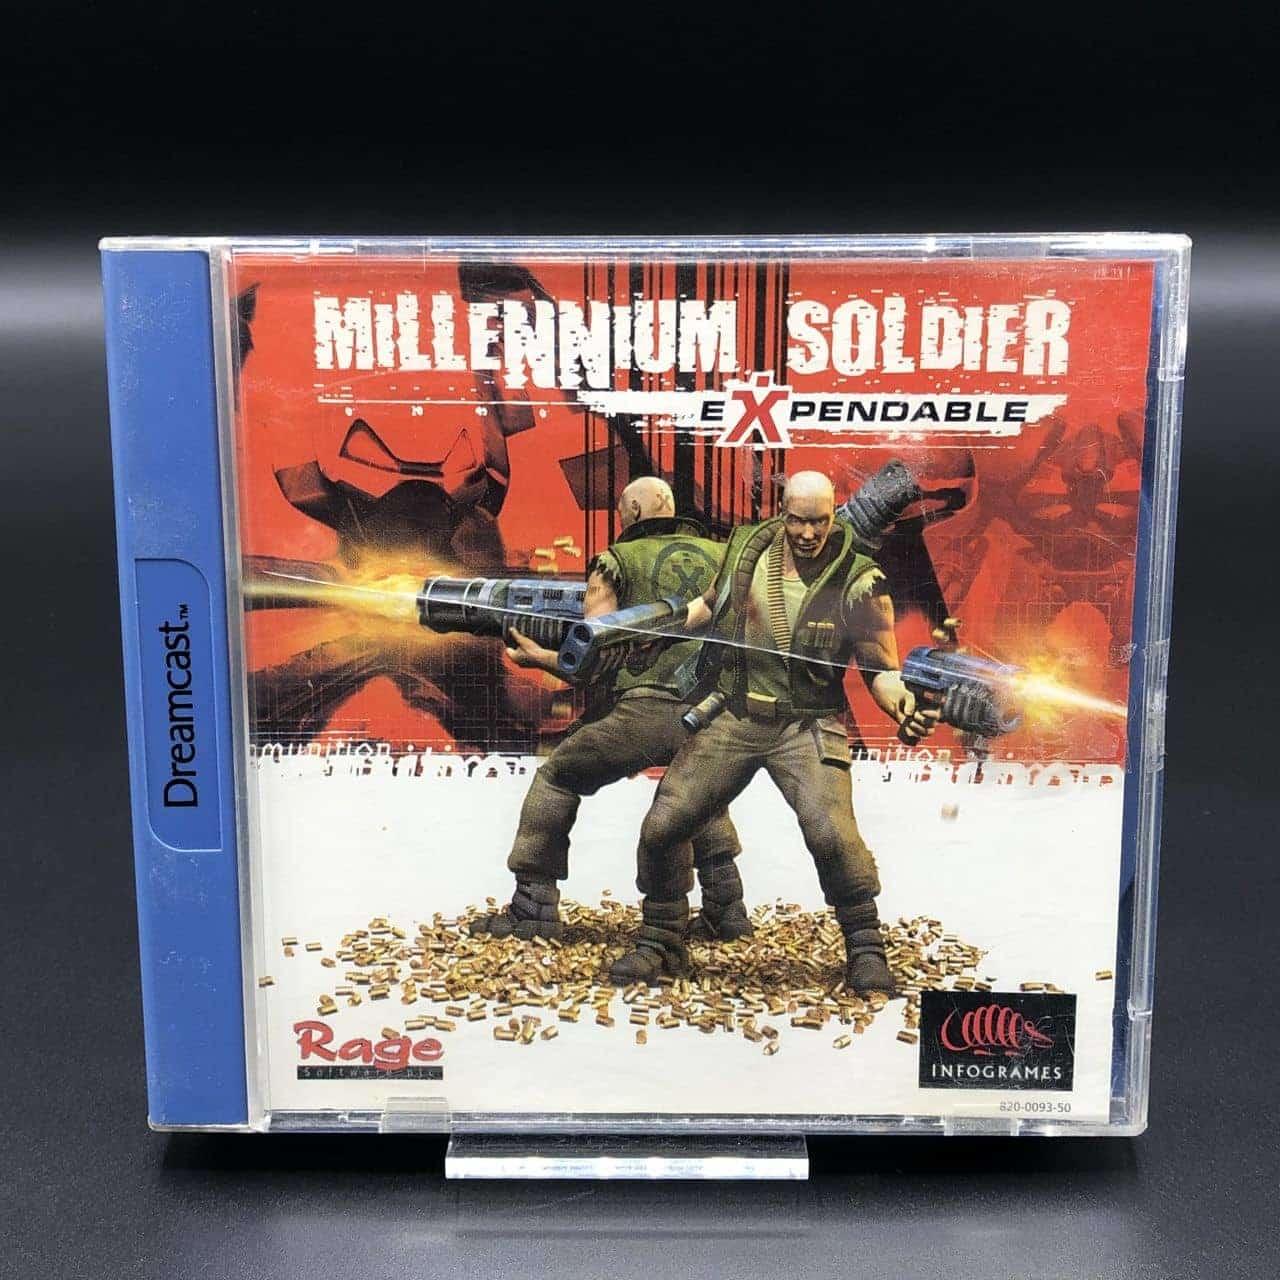 Millenium Soldier - Expendable (Komplett) (Gut) Sega Dreamcast